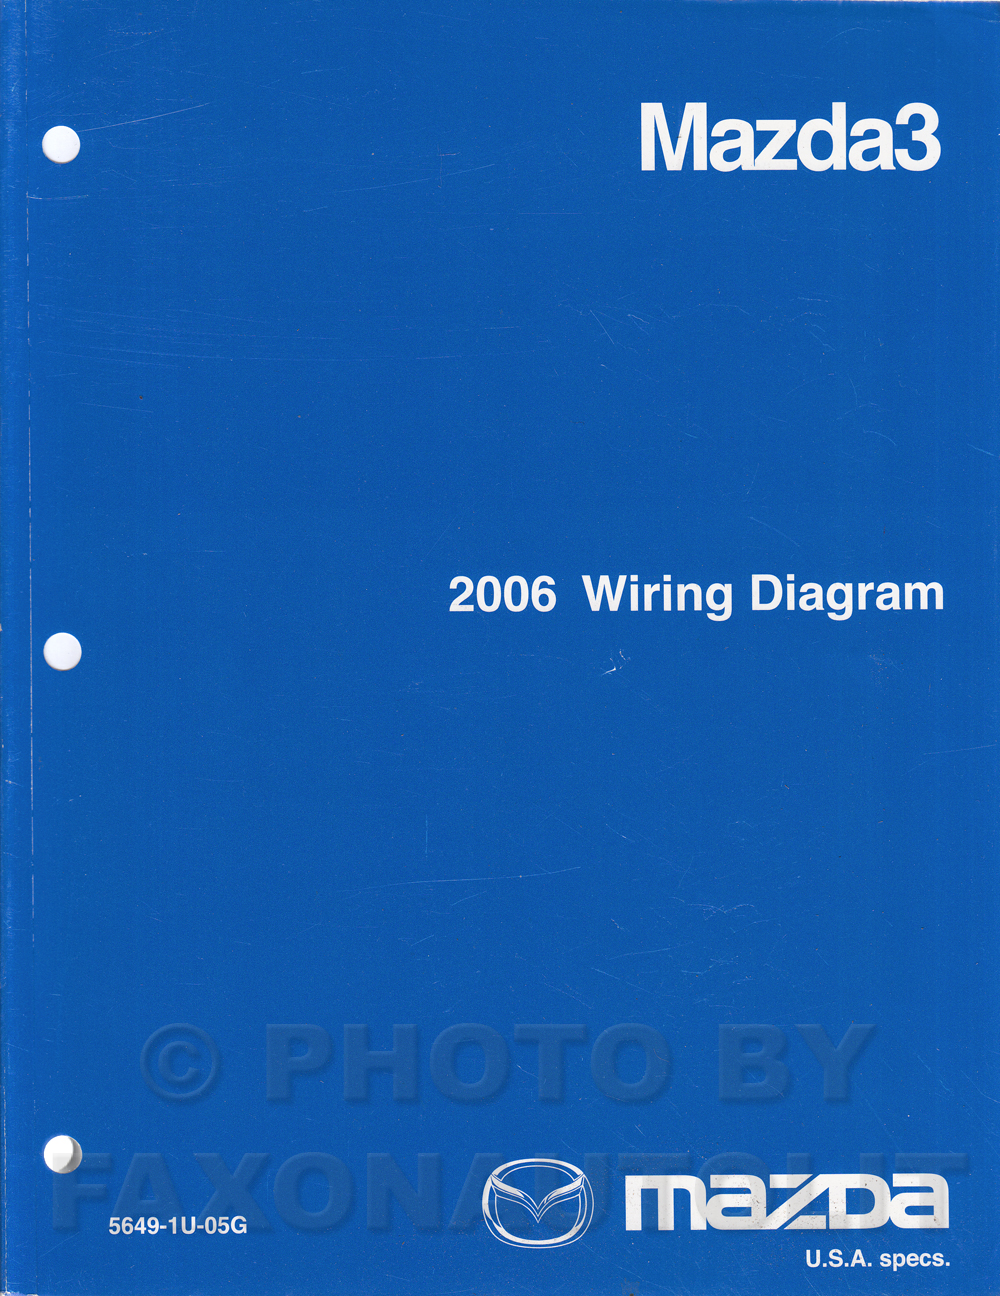 medium resolution of 2006 mazda 3 wiring diagram original mazda3 2006 mazda 3 radio wiring diagram 2006 mazda 3 wiring diagrams